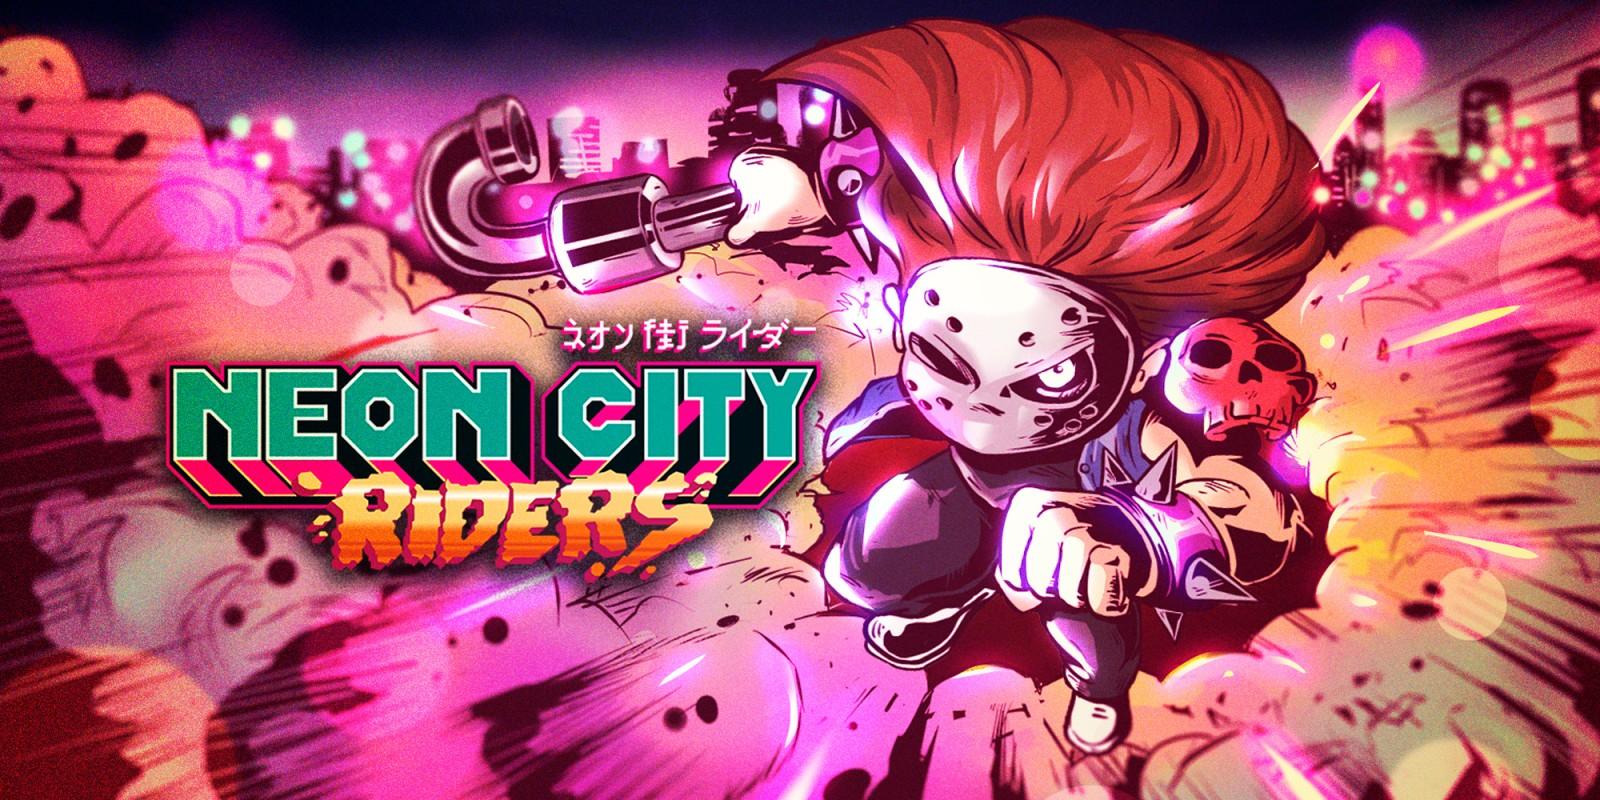 Обзор Neon City Riders – олдсукльный хардкор